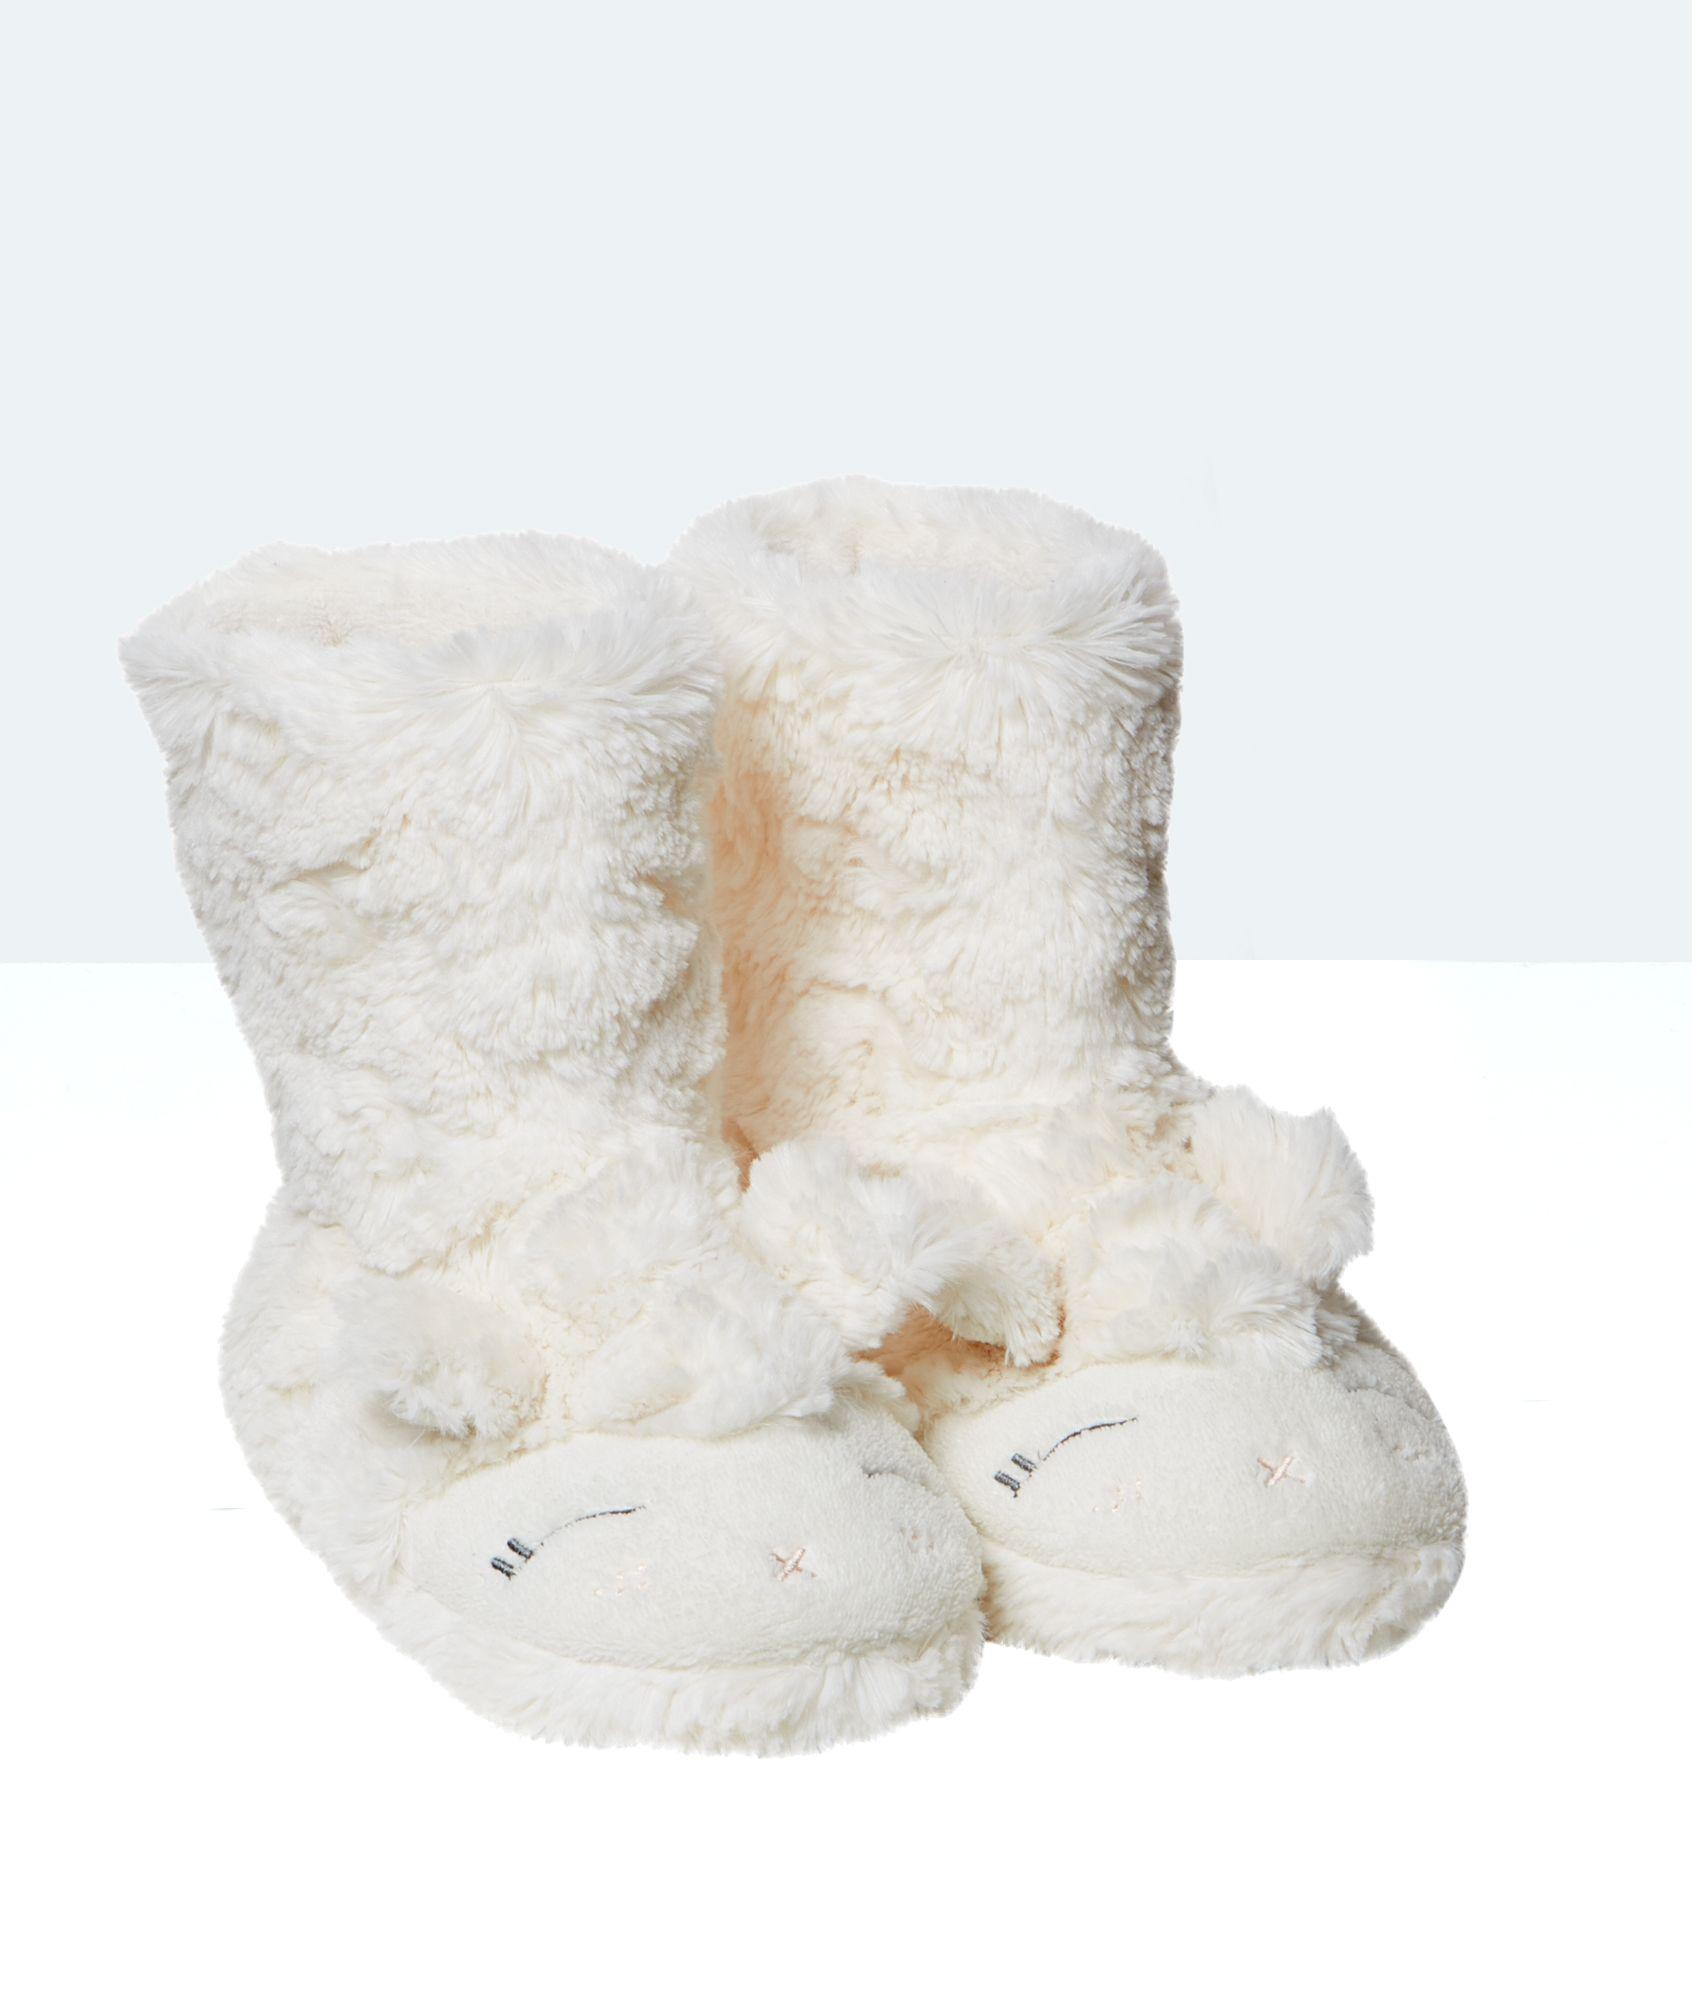 d7738cd925c Bottines chaussons fausse fourrure mouton - SHEEP - ECRU - Etam ...